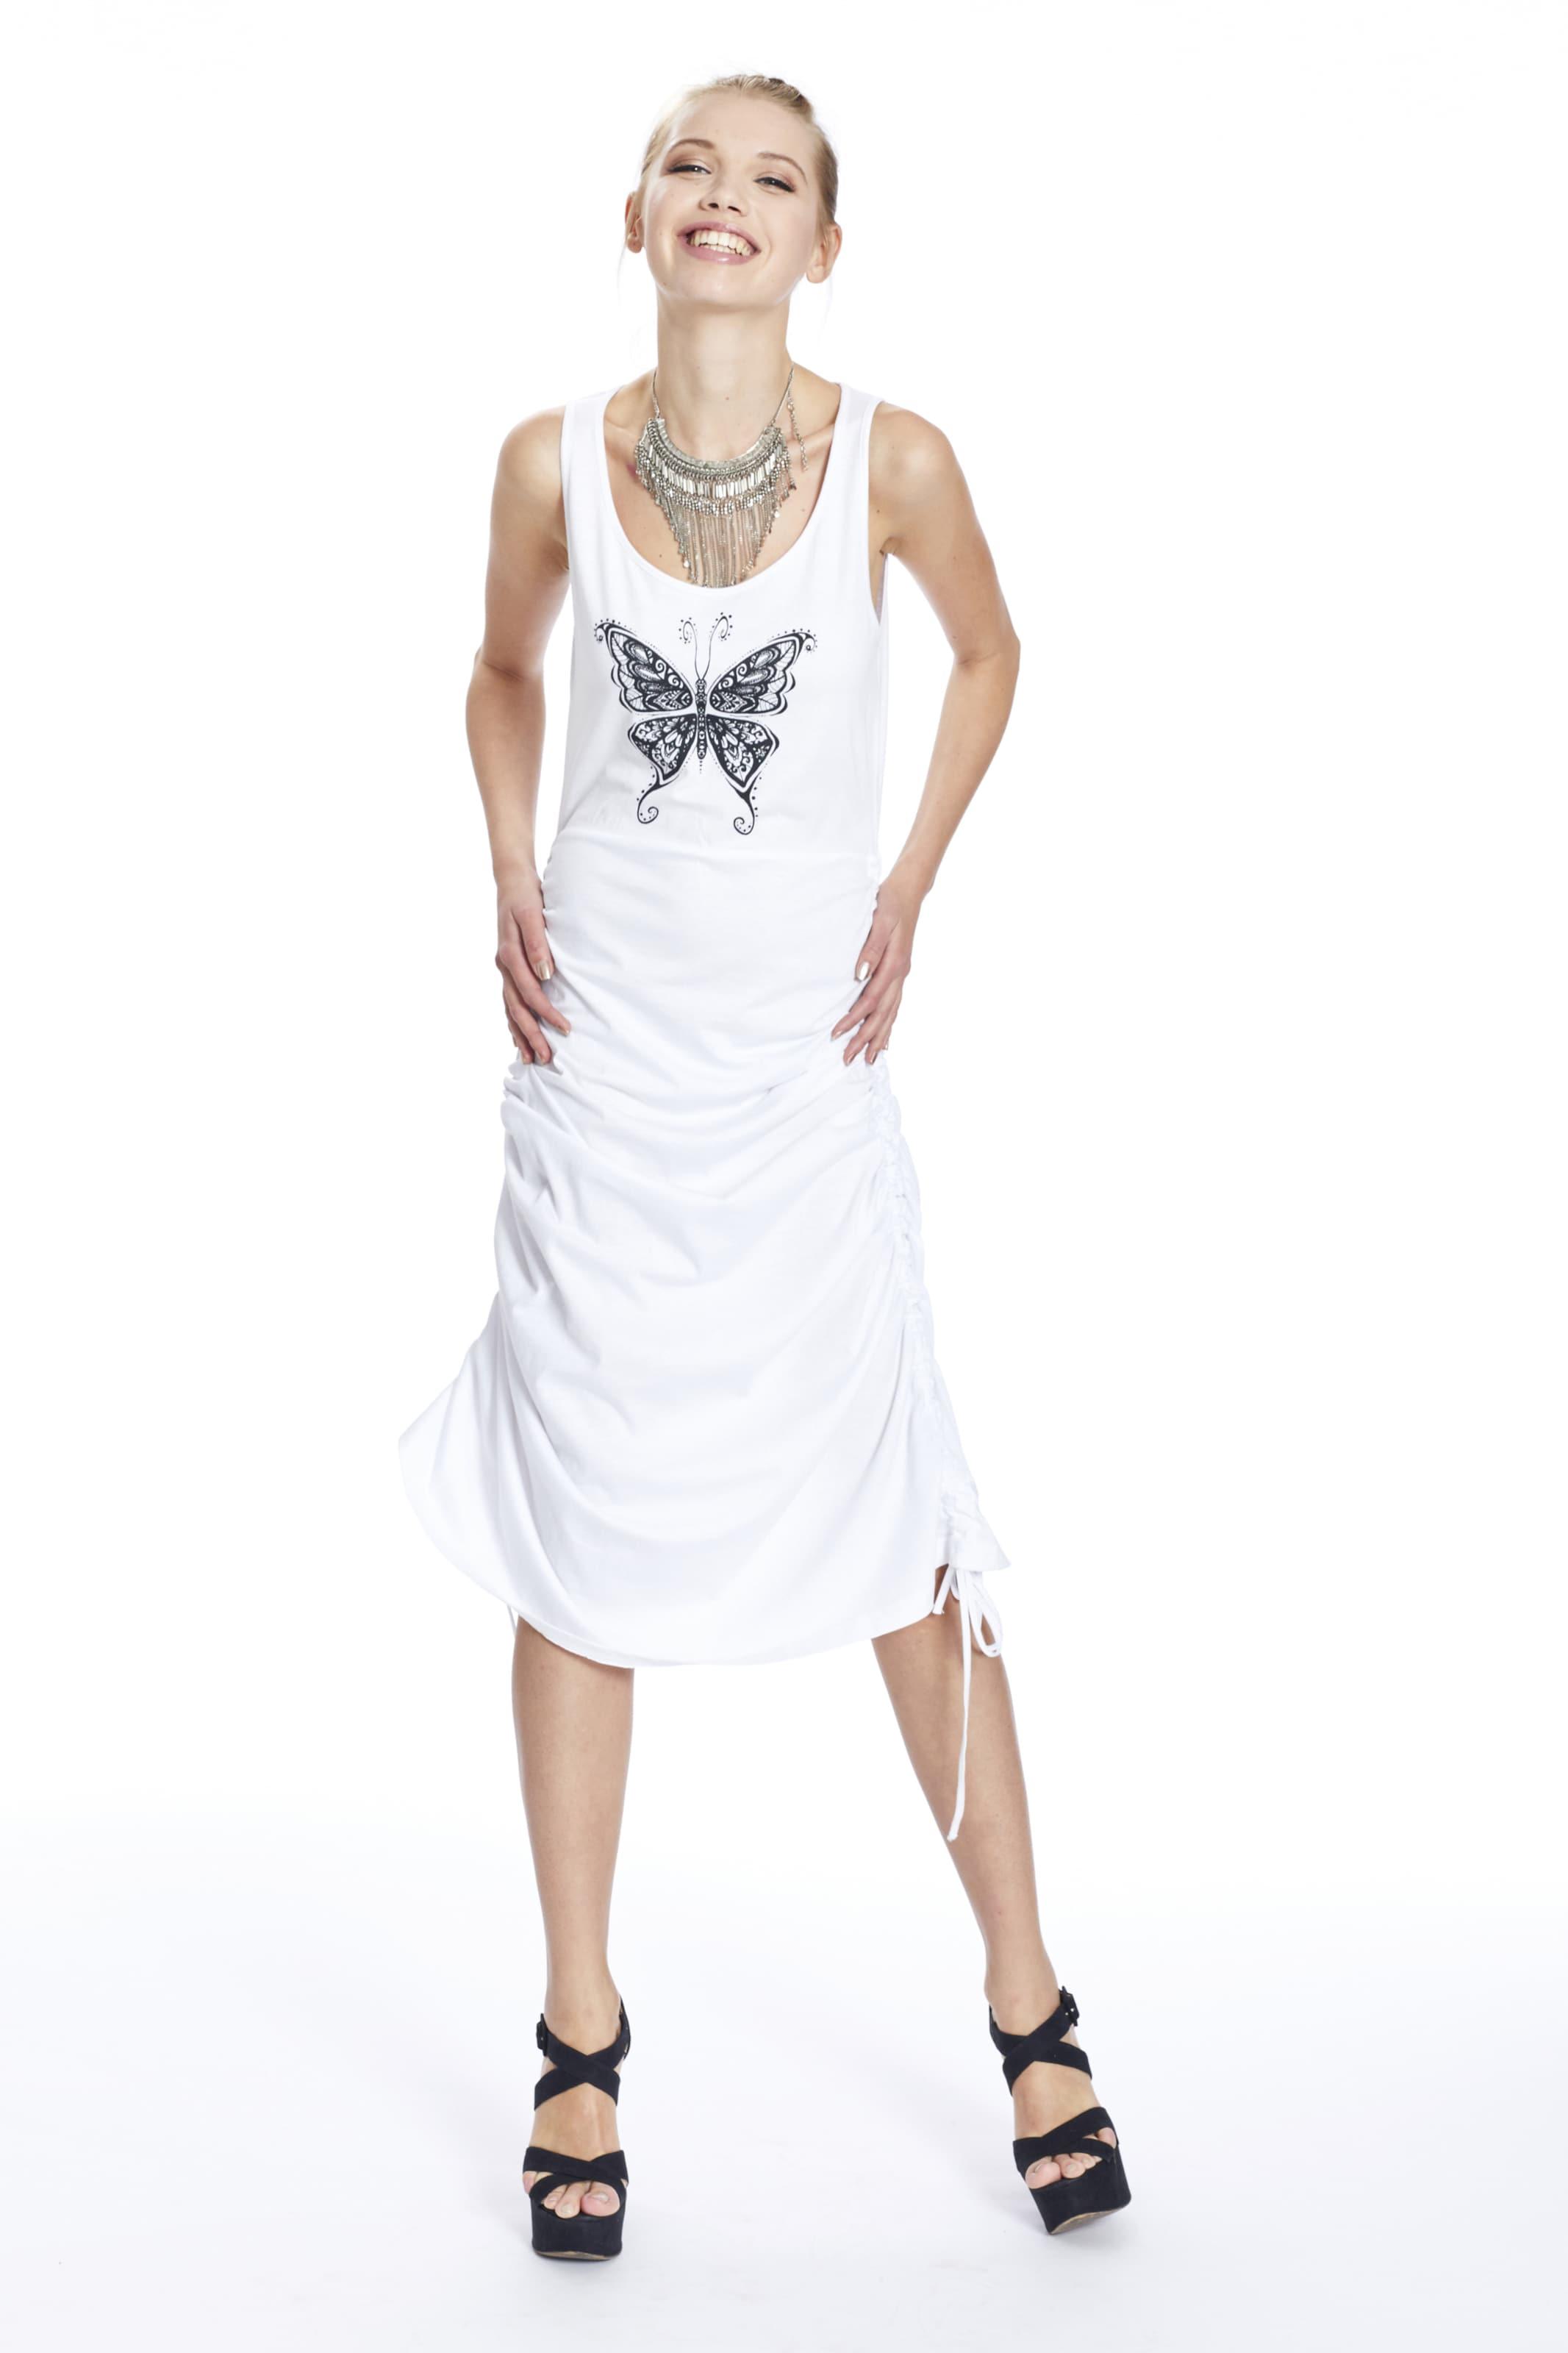 Mymo Kleid Mymo In Mymo Kleid Kleid Weiß In Weiß In Weiß TJFKcl1